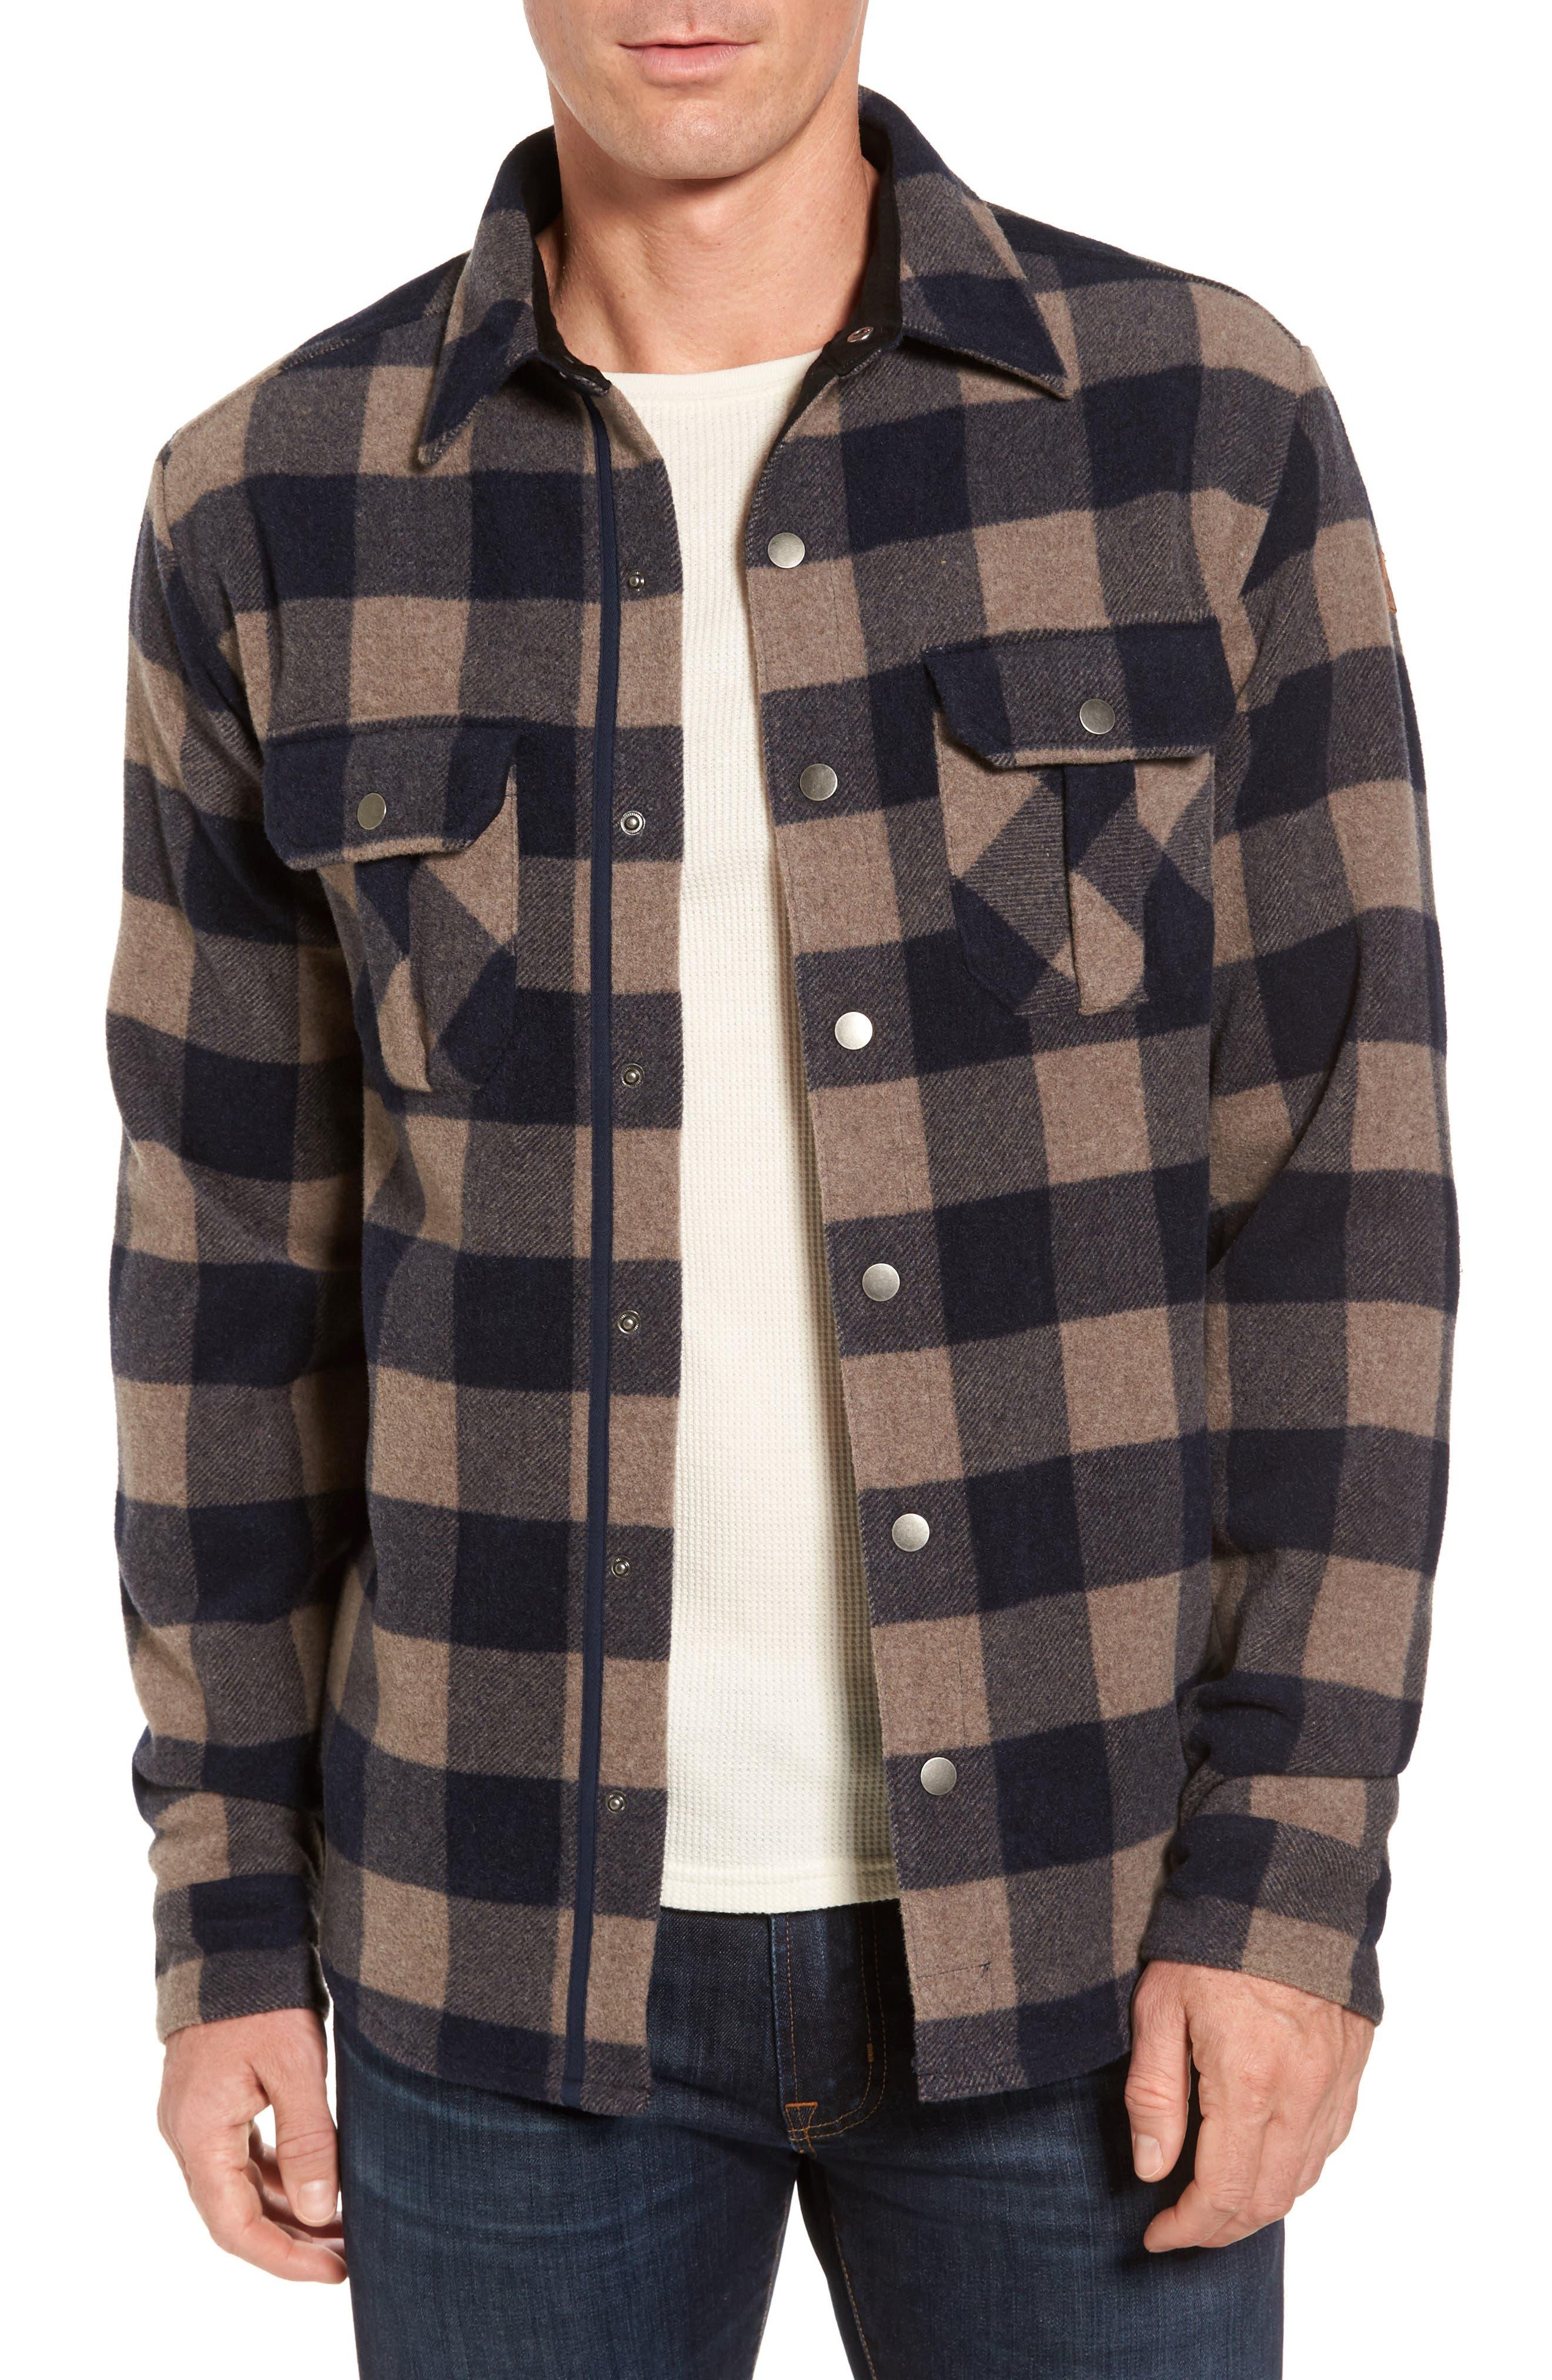 Anchor Line Flannel Shirt Jacket,                             Main thumbnail 1, color,                             Navy